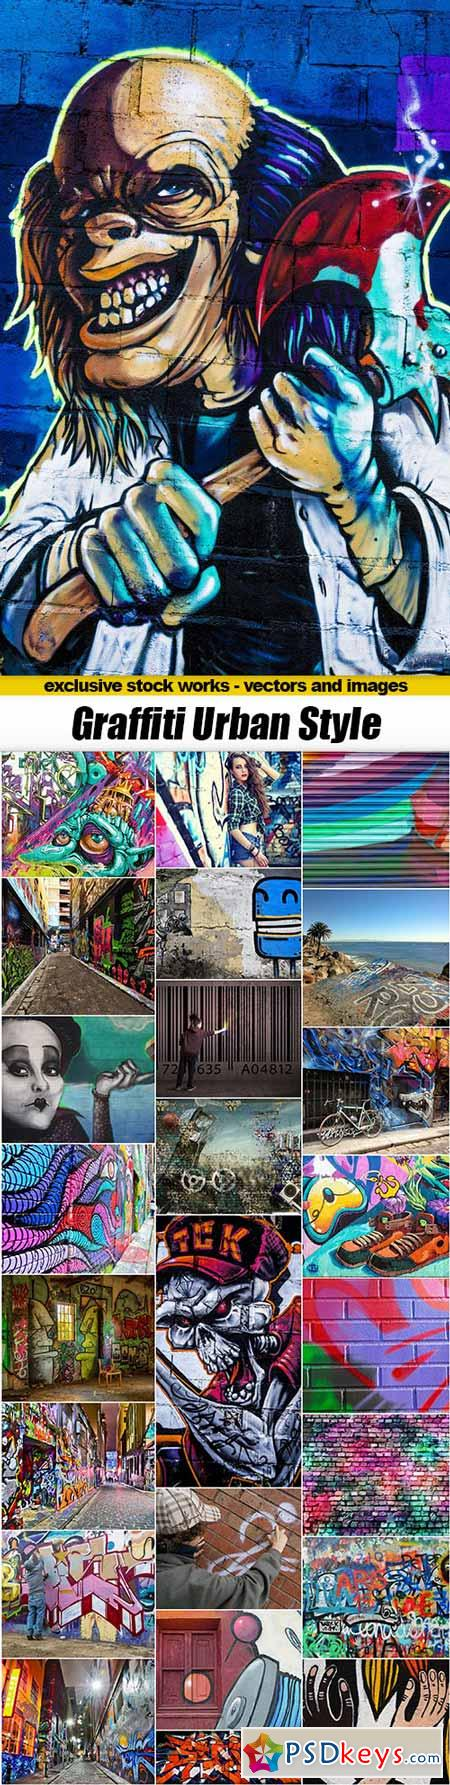 Graffiti Urban Style - 25xUHQ JPEG